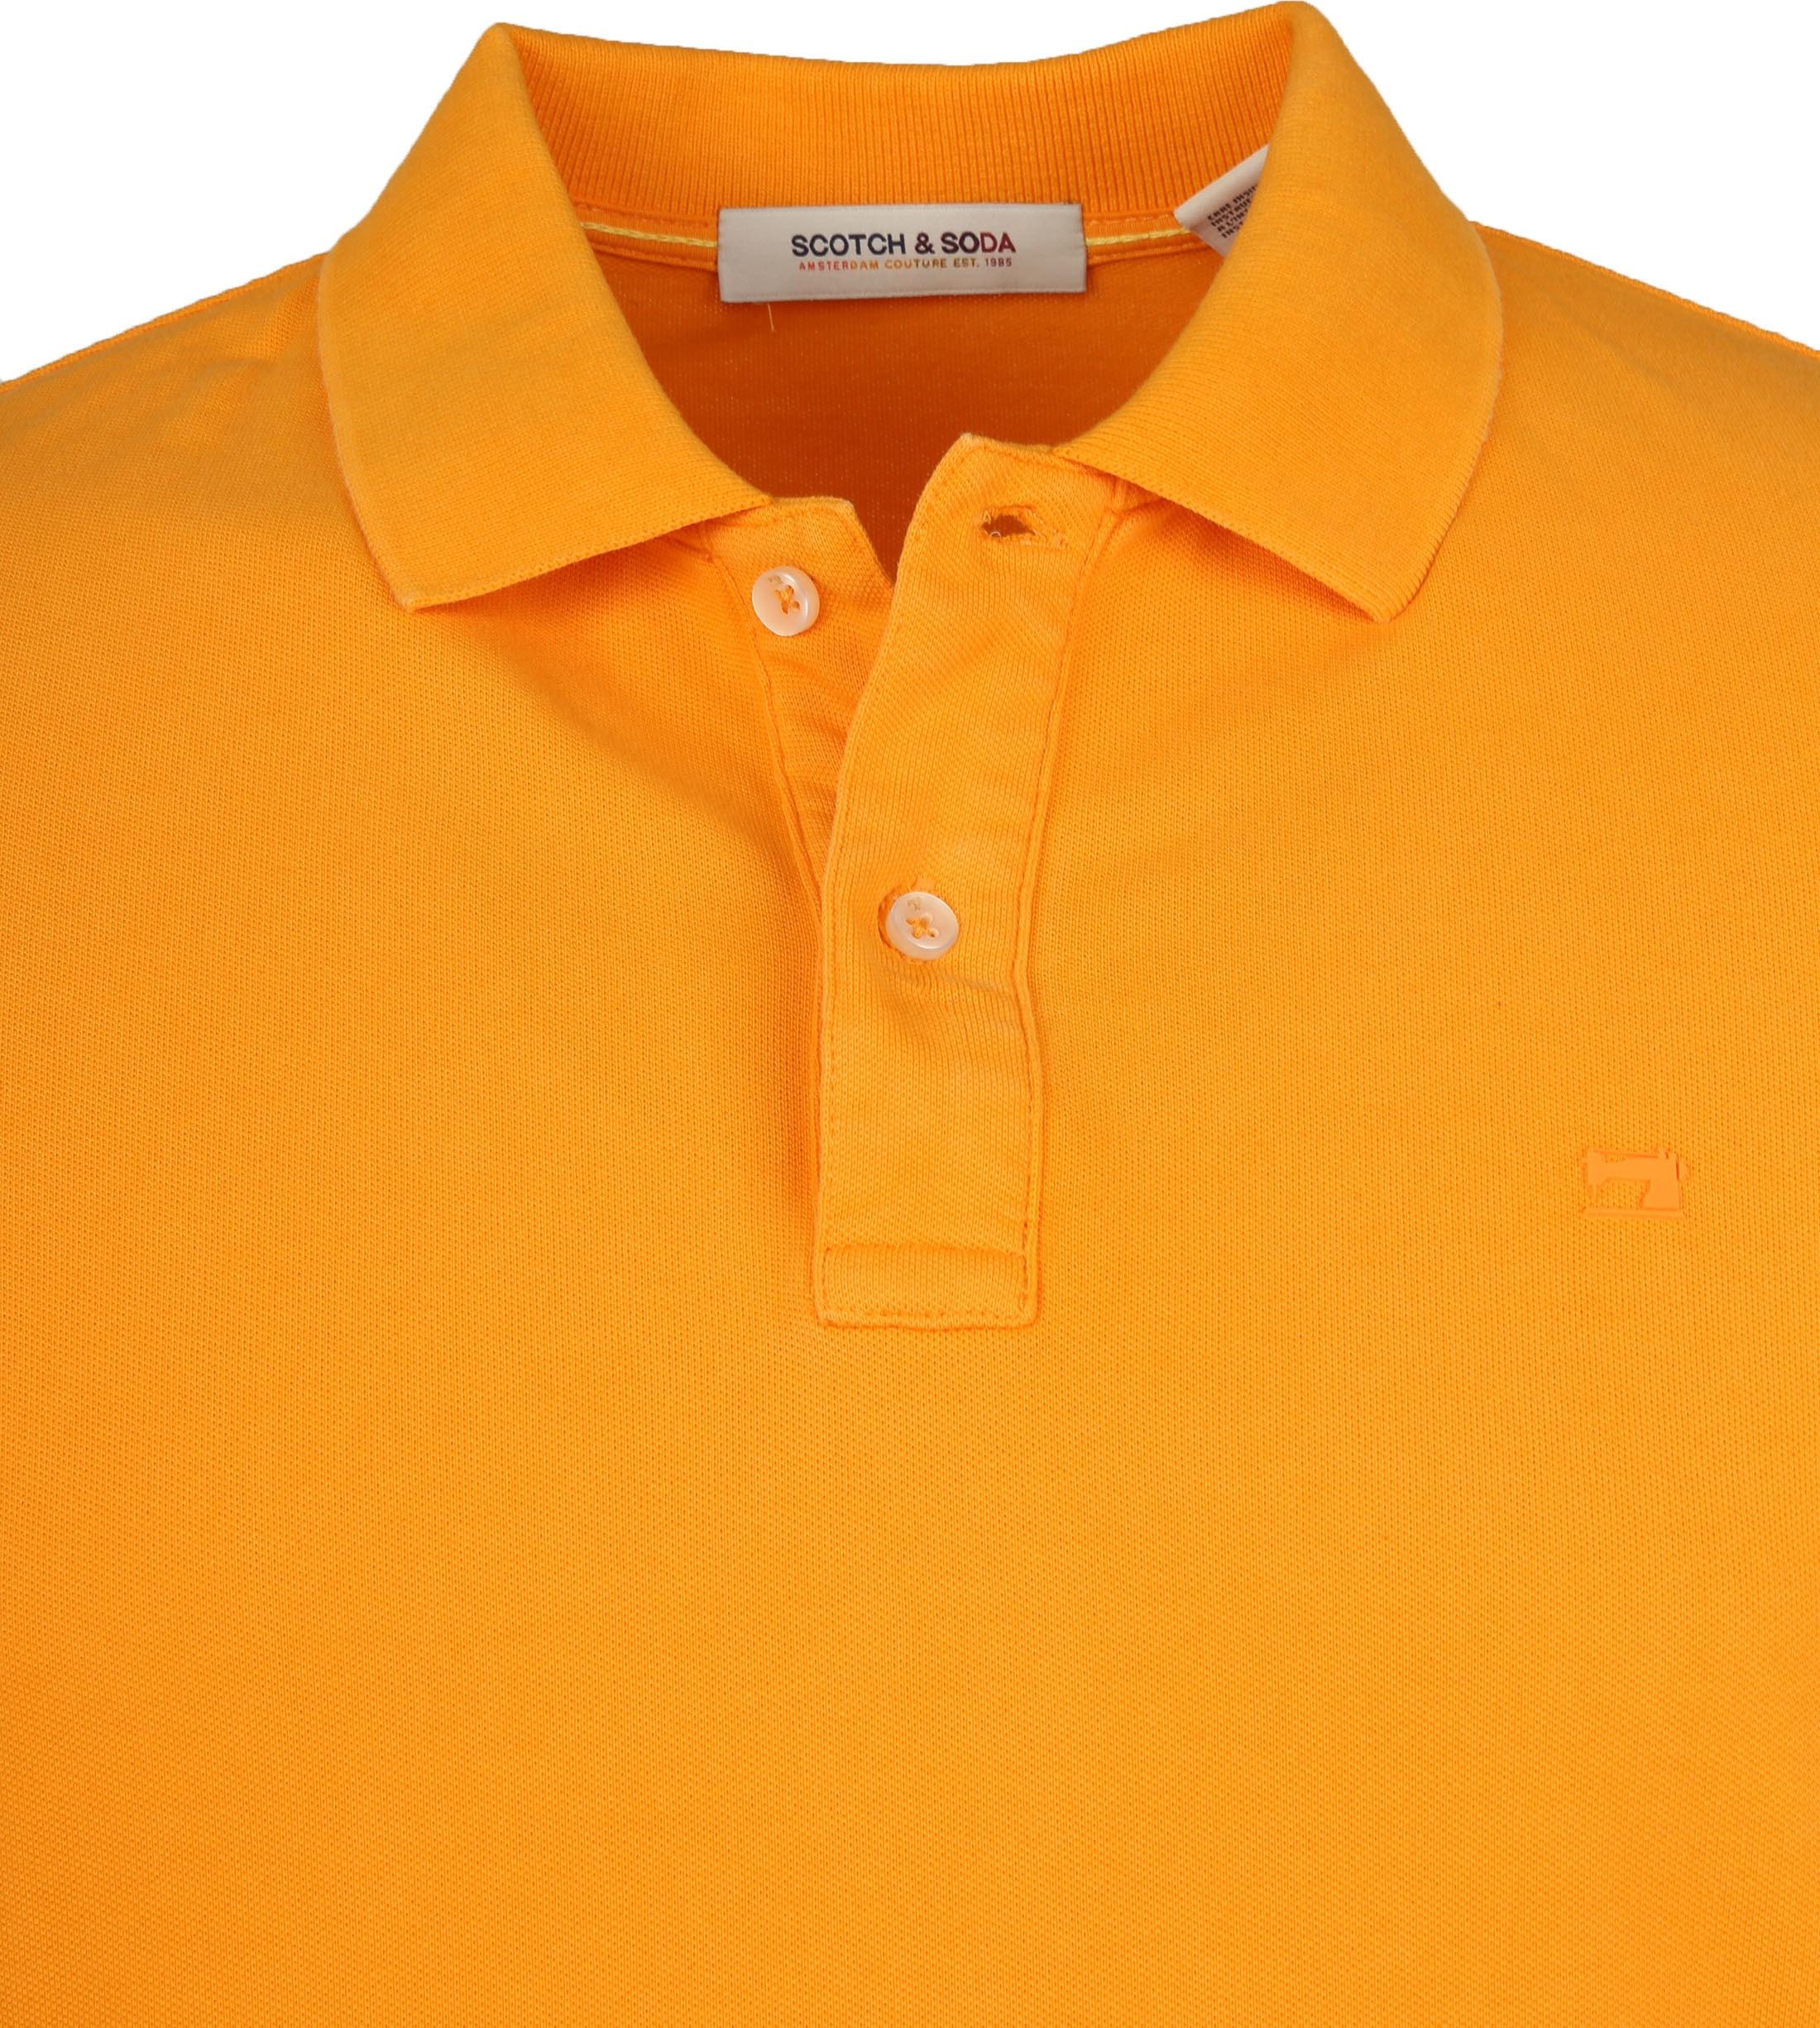 Scotch and Soda Polo Naranja Oranje